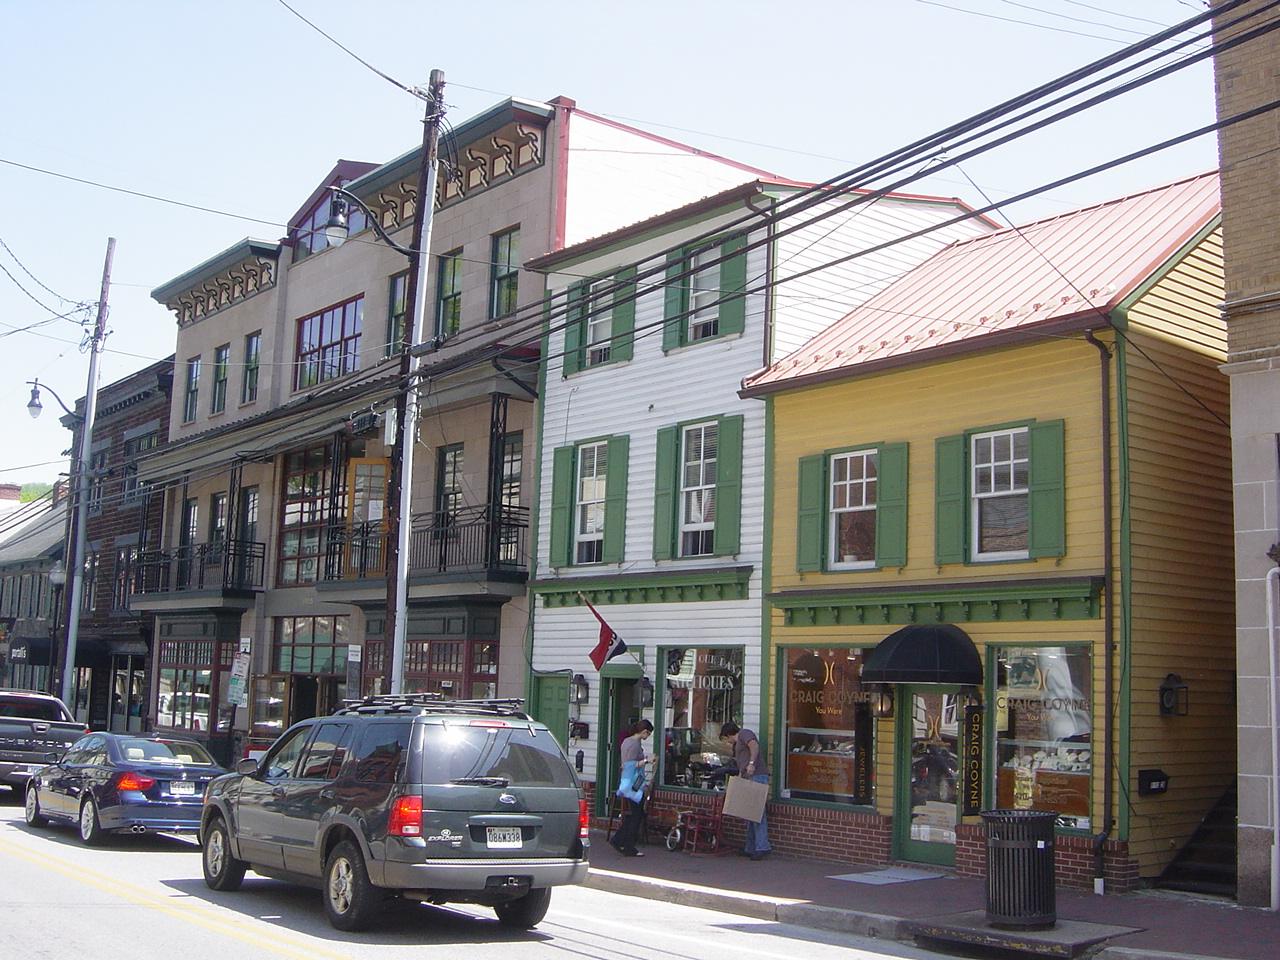 Downtown Ellicott City Md Restaurants